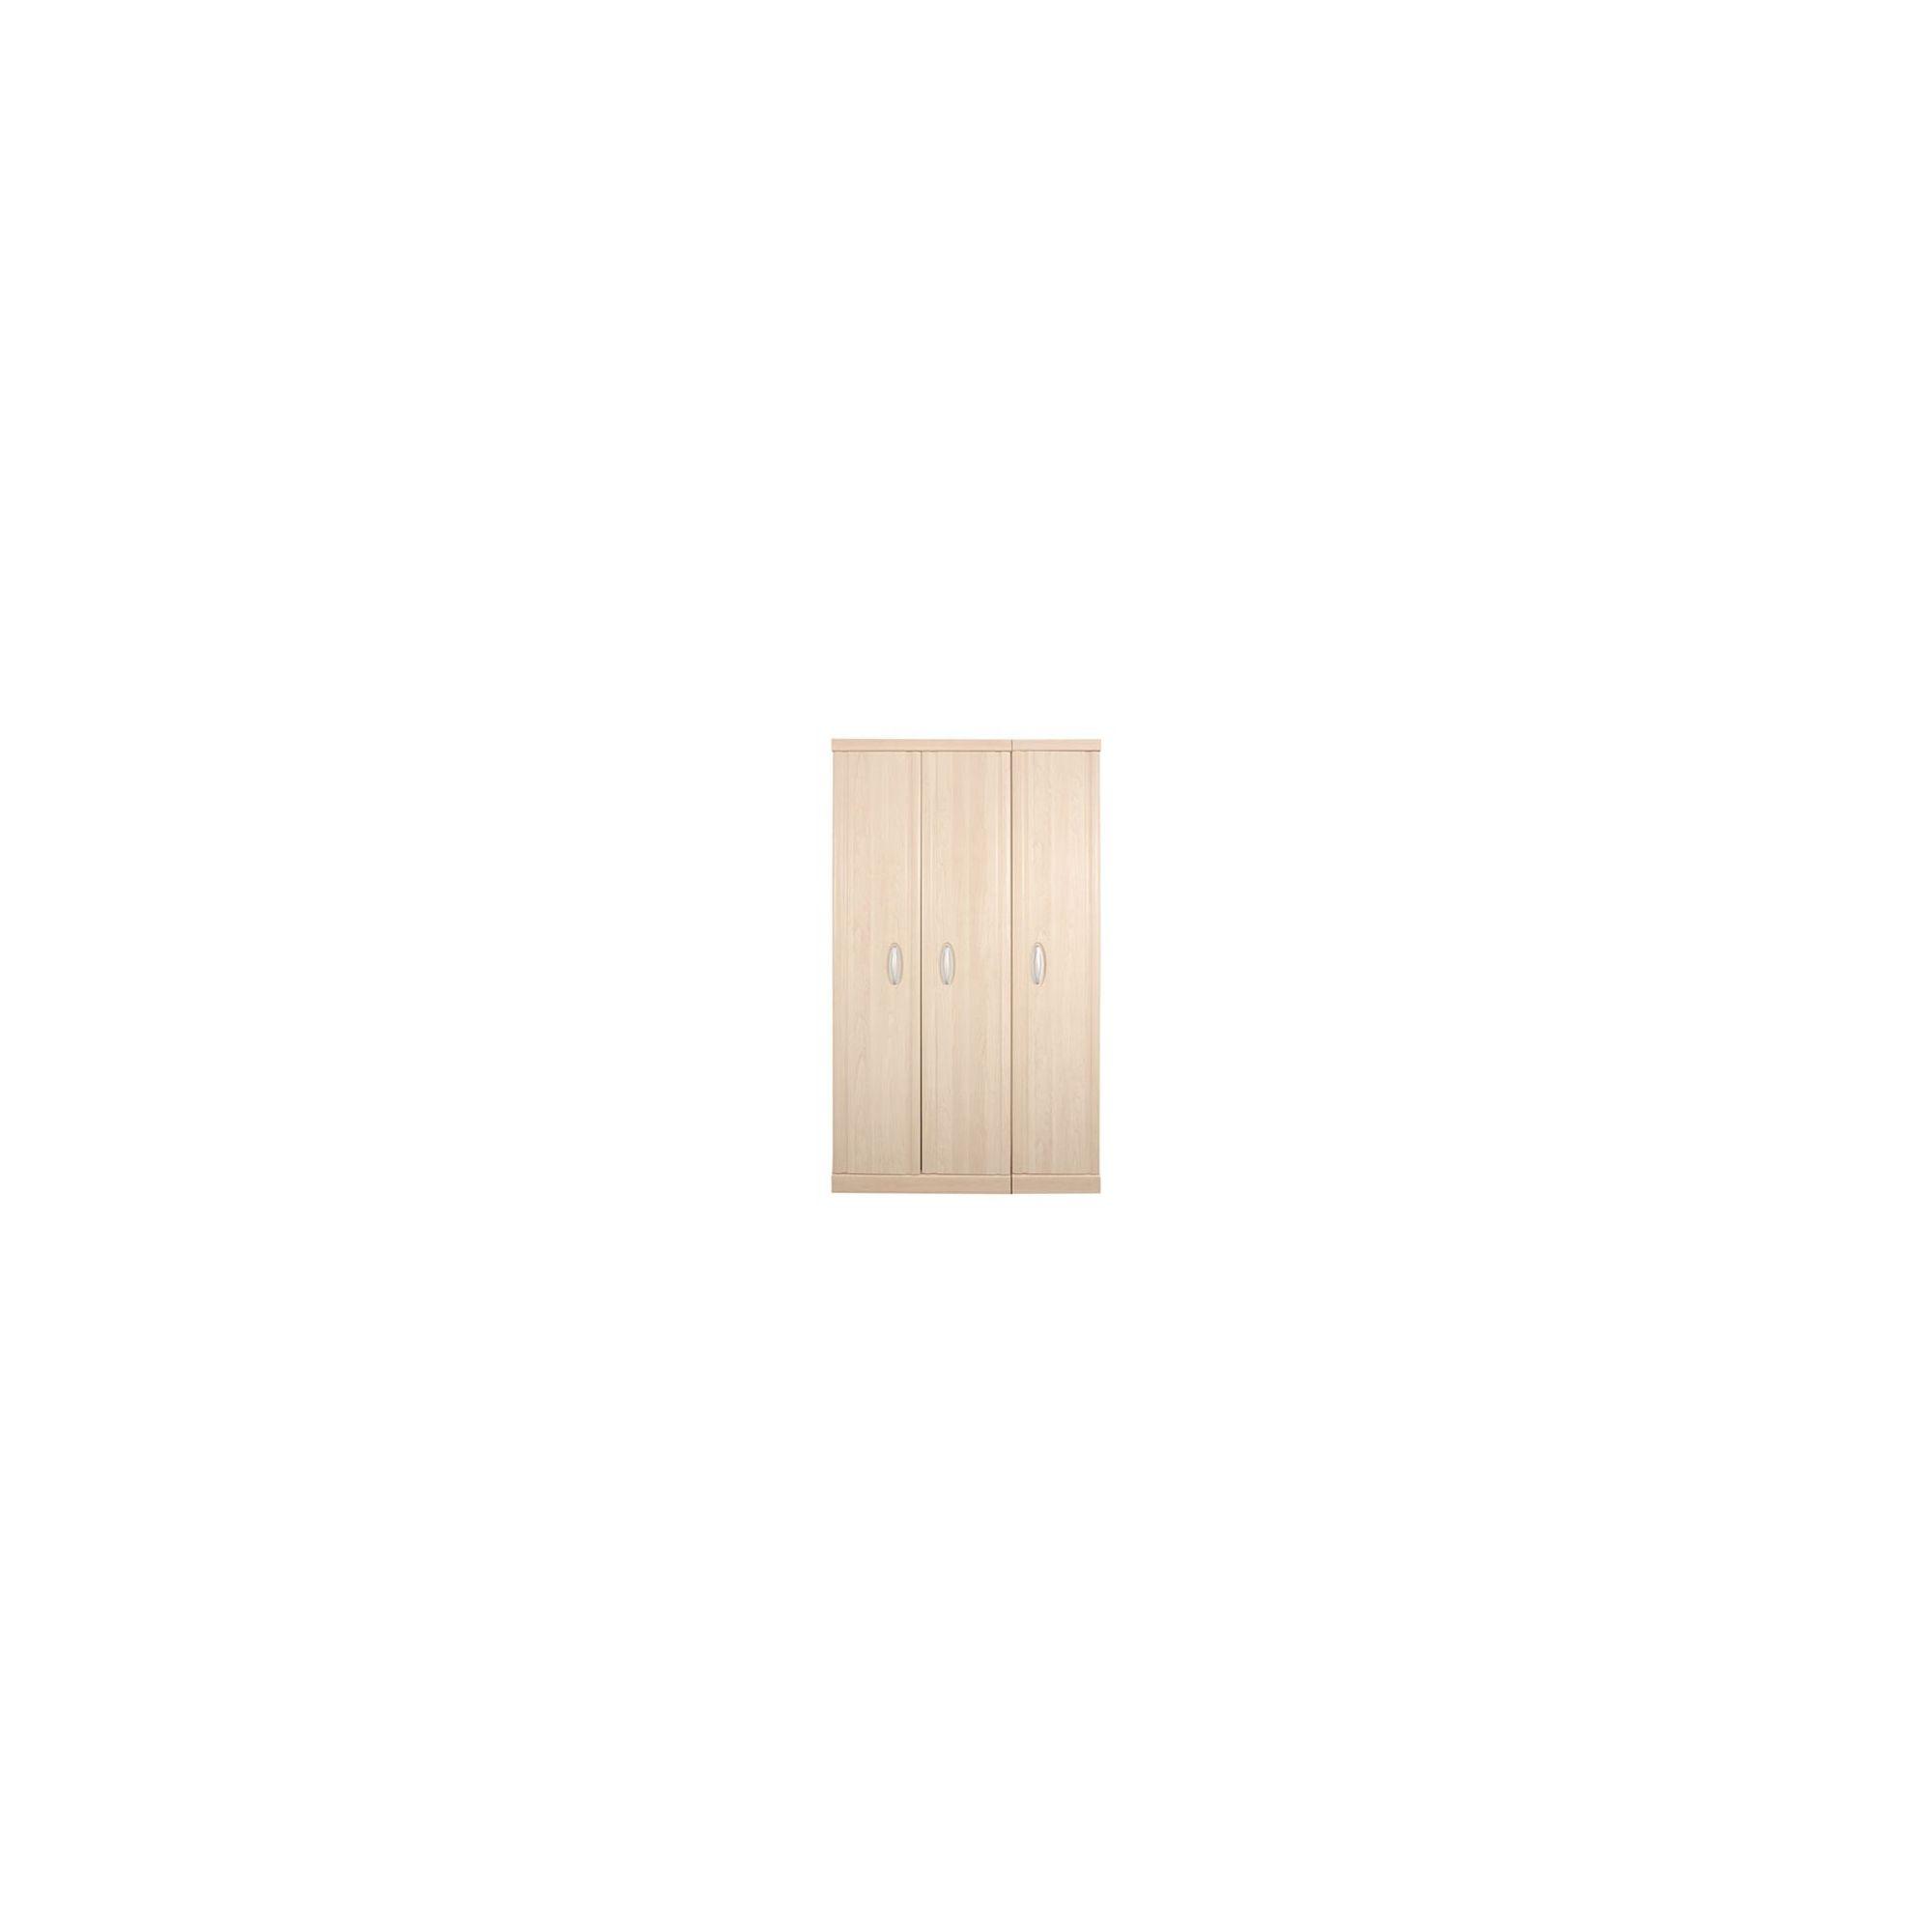 Caxton Strata 3 Door Wardrobe in Pearwood at Tesco Direct